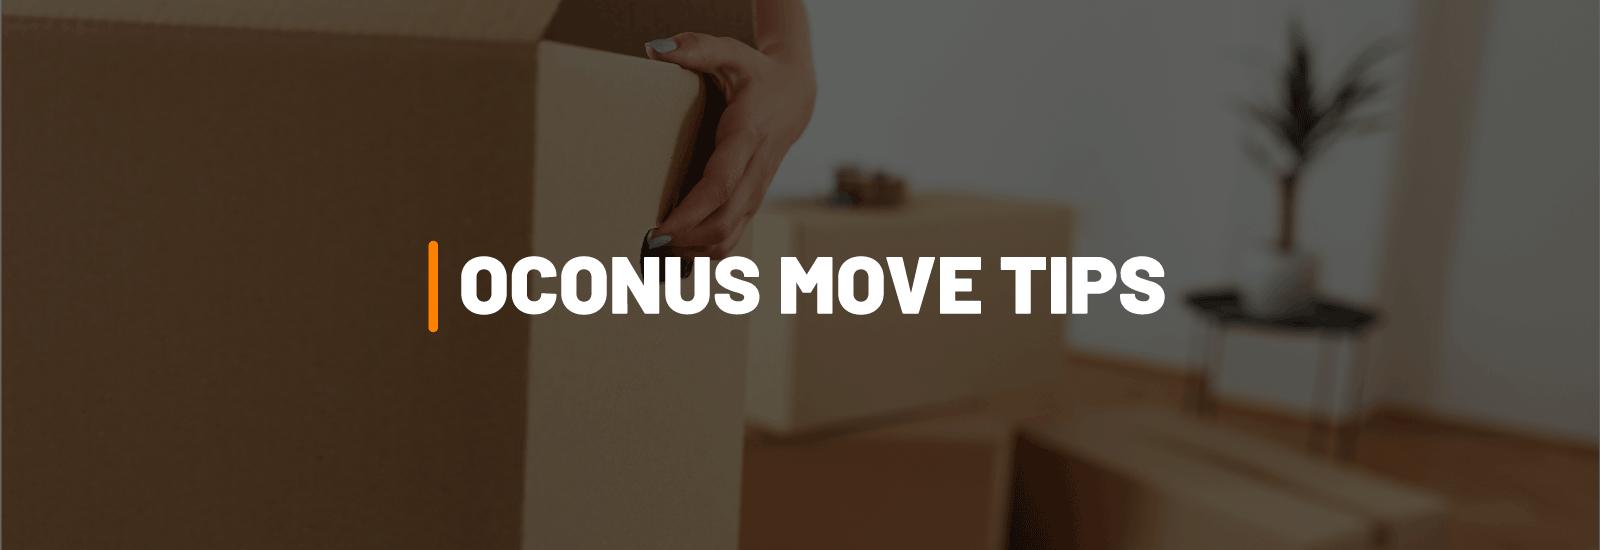 OCONUS Move Tips